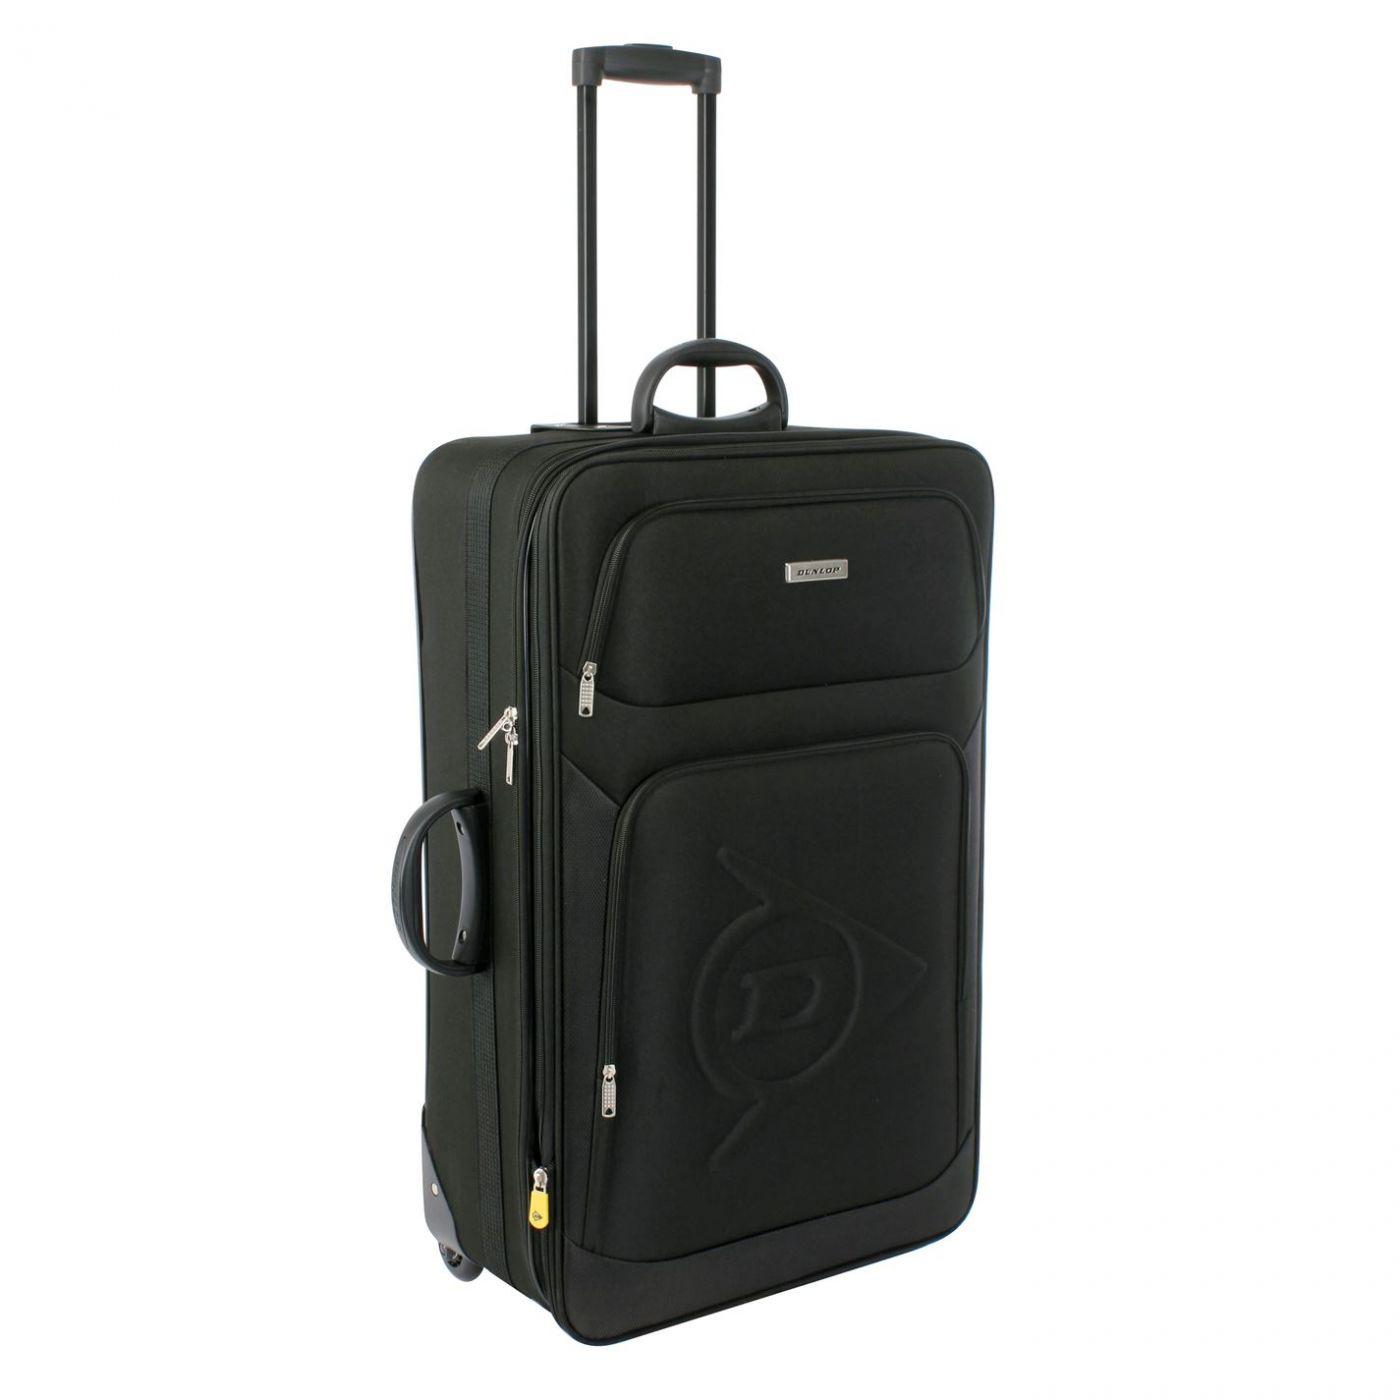 Slazenger Trolley Suitcase